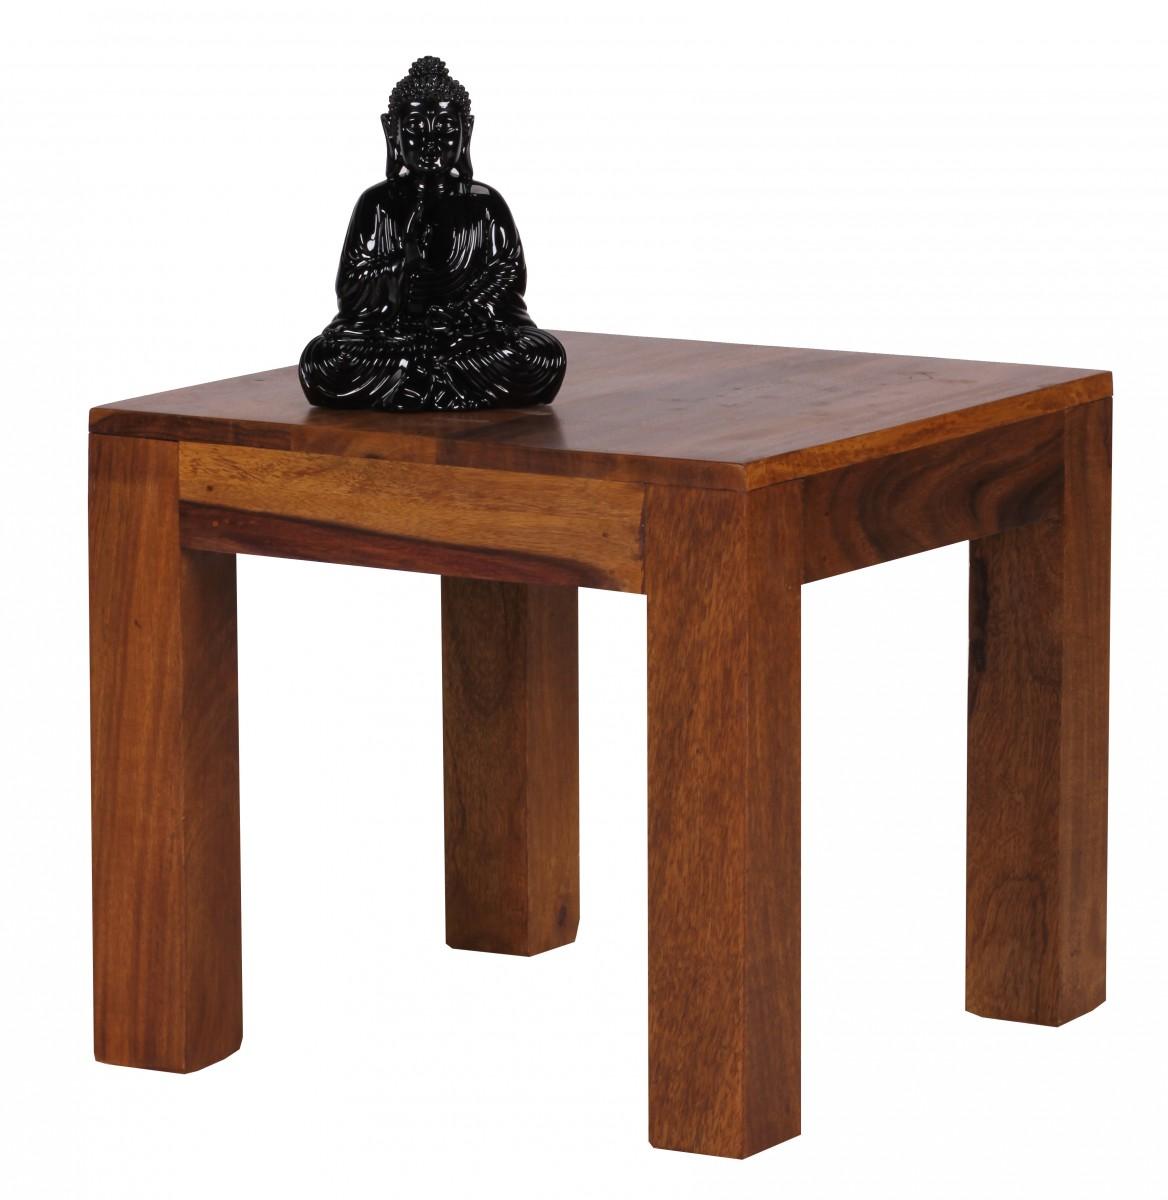 Sheesham Couchtisch Massiv 45 x 45 cm Massivholz